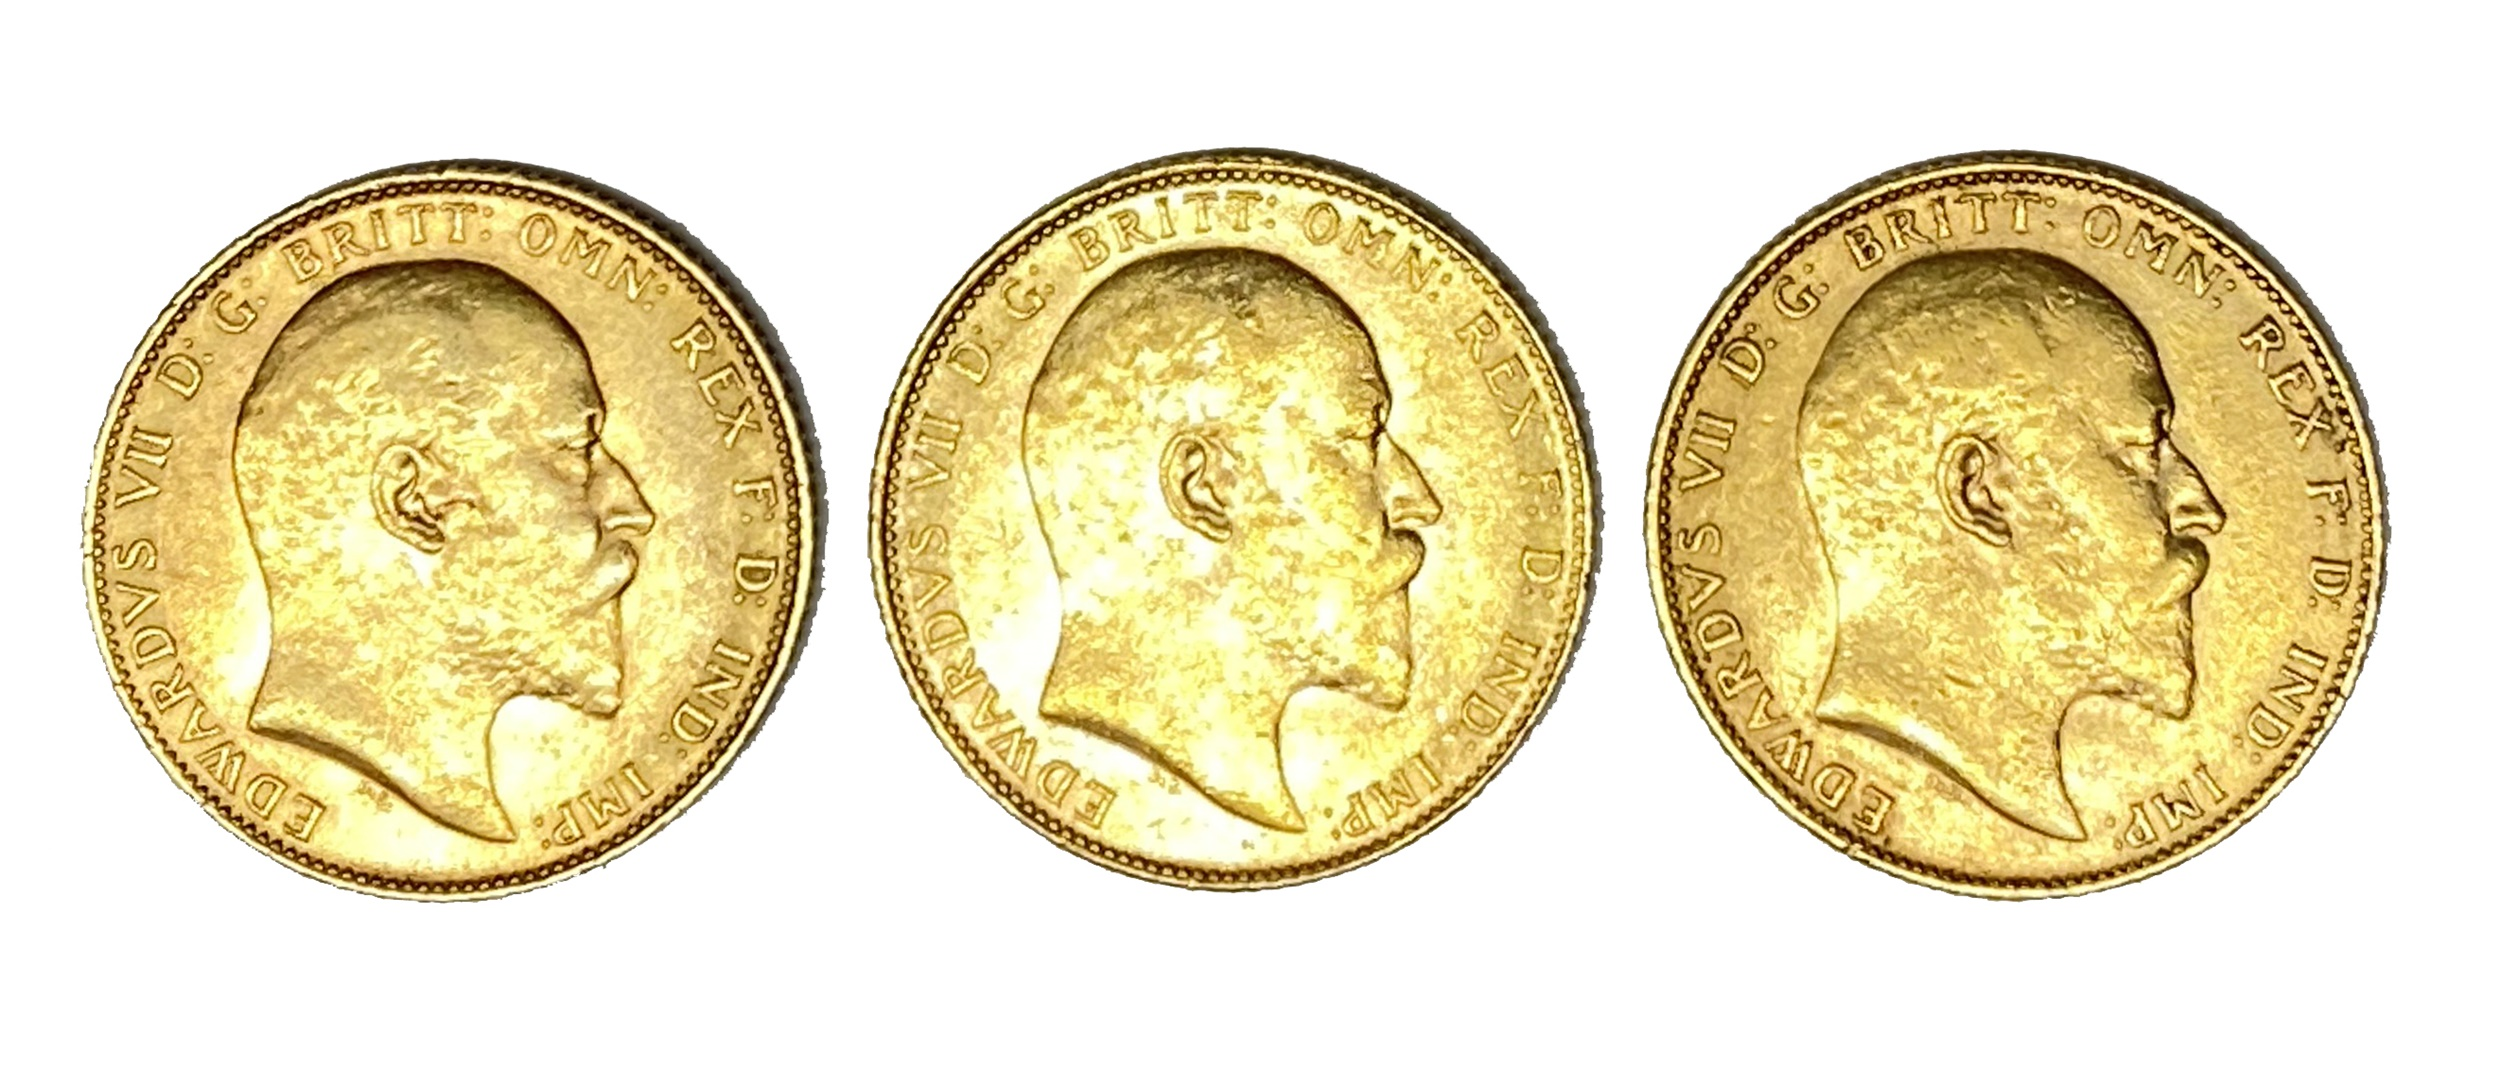 Edward VII three gold Sovereign coins, 1910